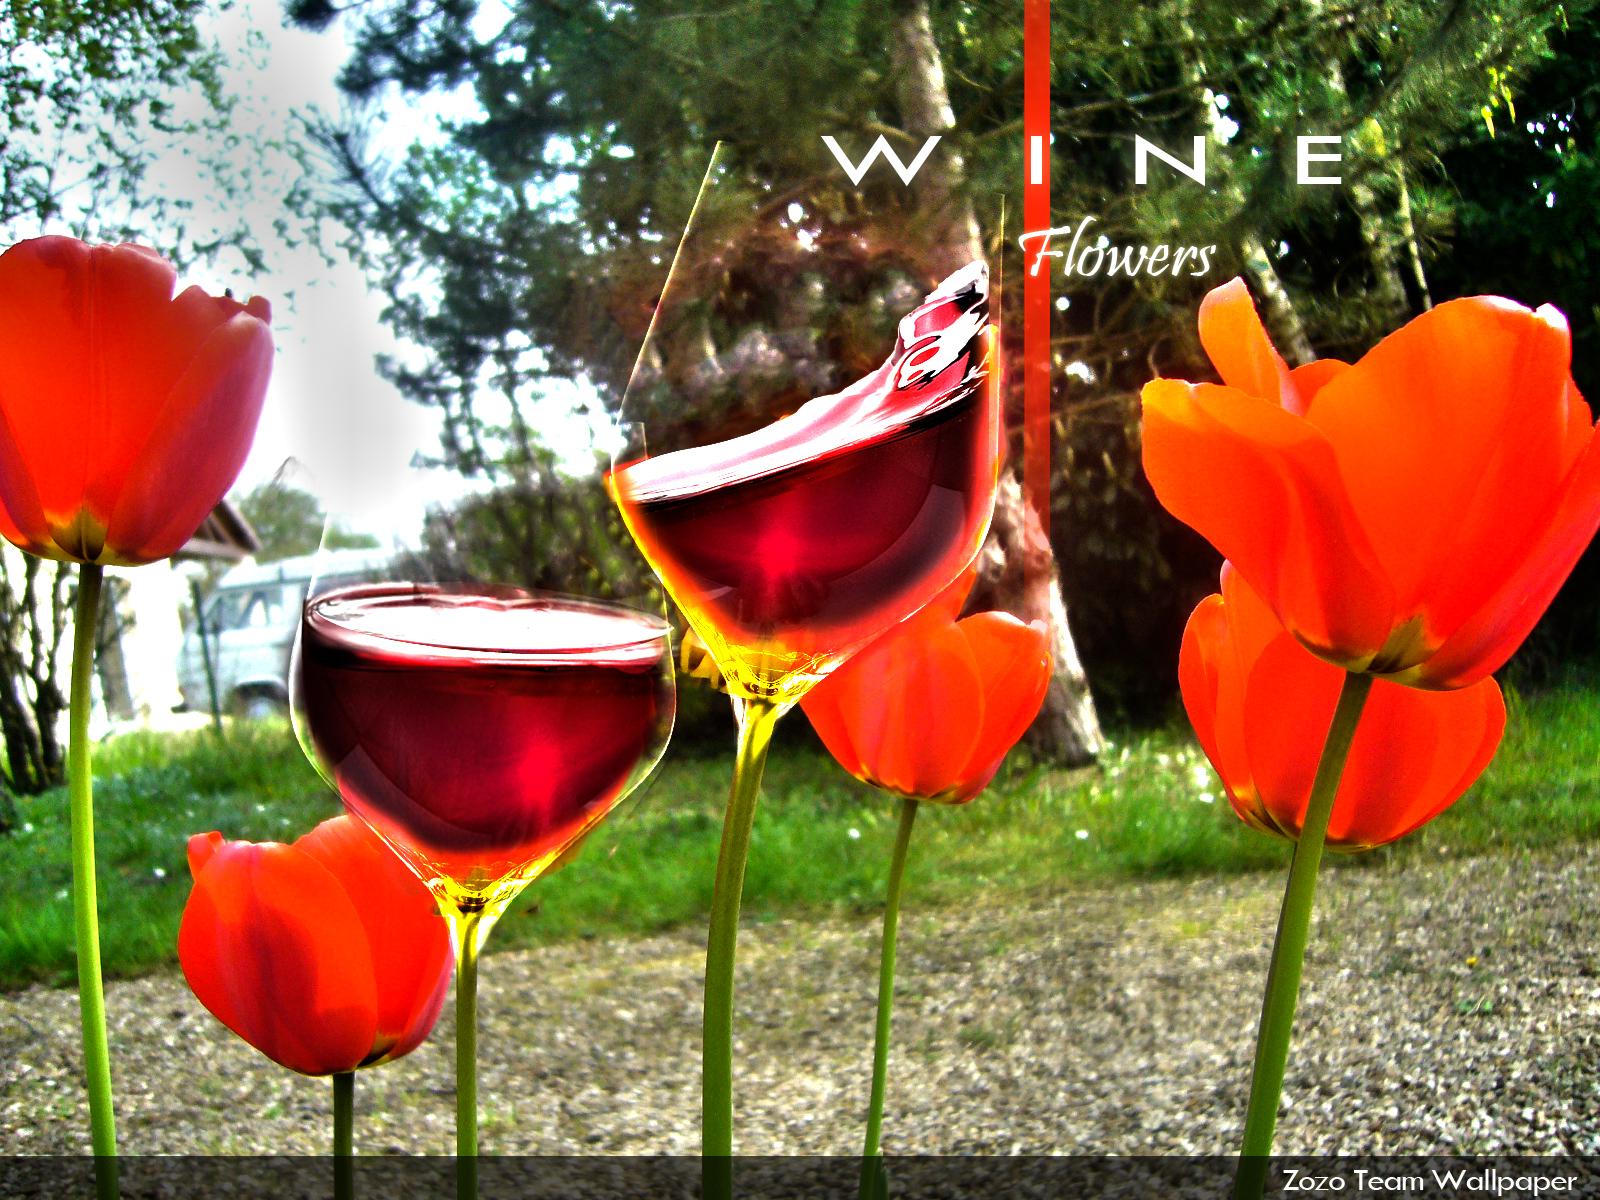 Wine Flowers